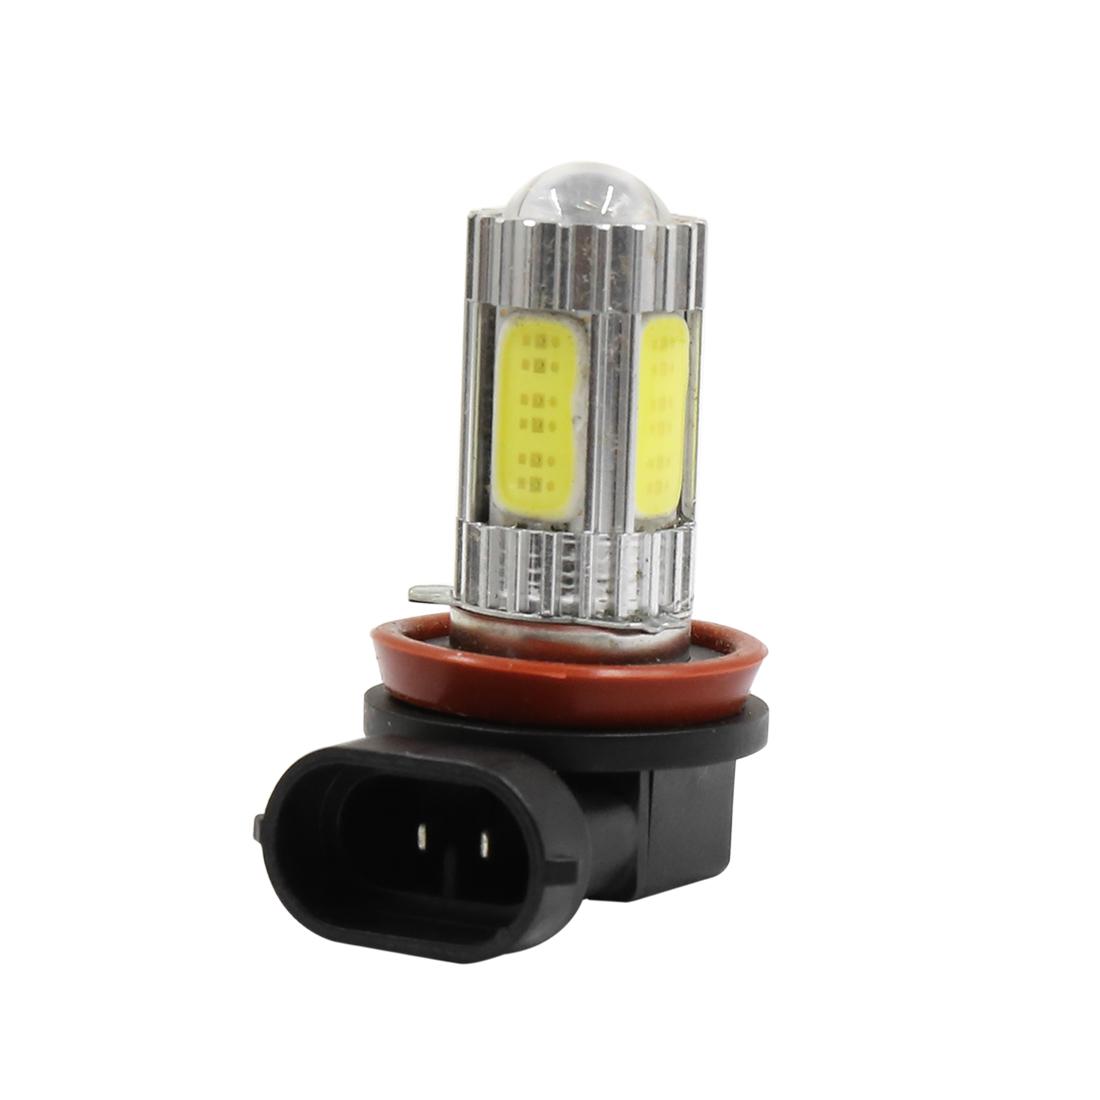 DC 12V 25W H8 White 5 COB LED Foglight Headlight Driving Light Lamp Bulb for Car